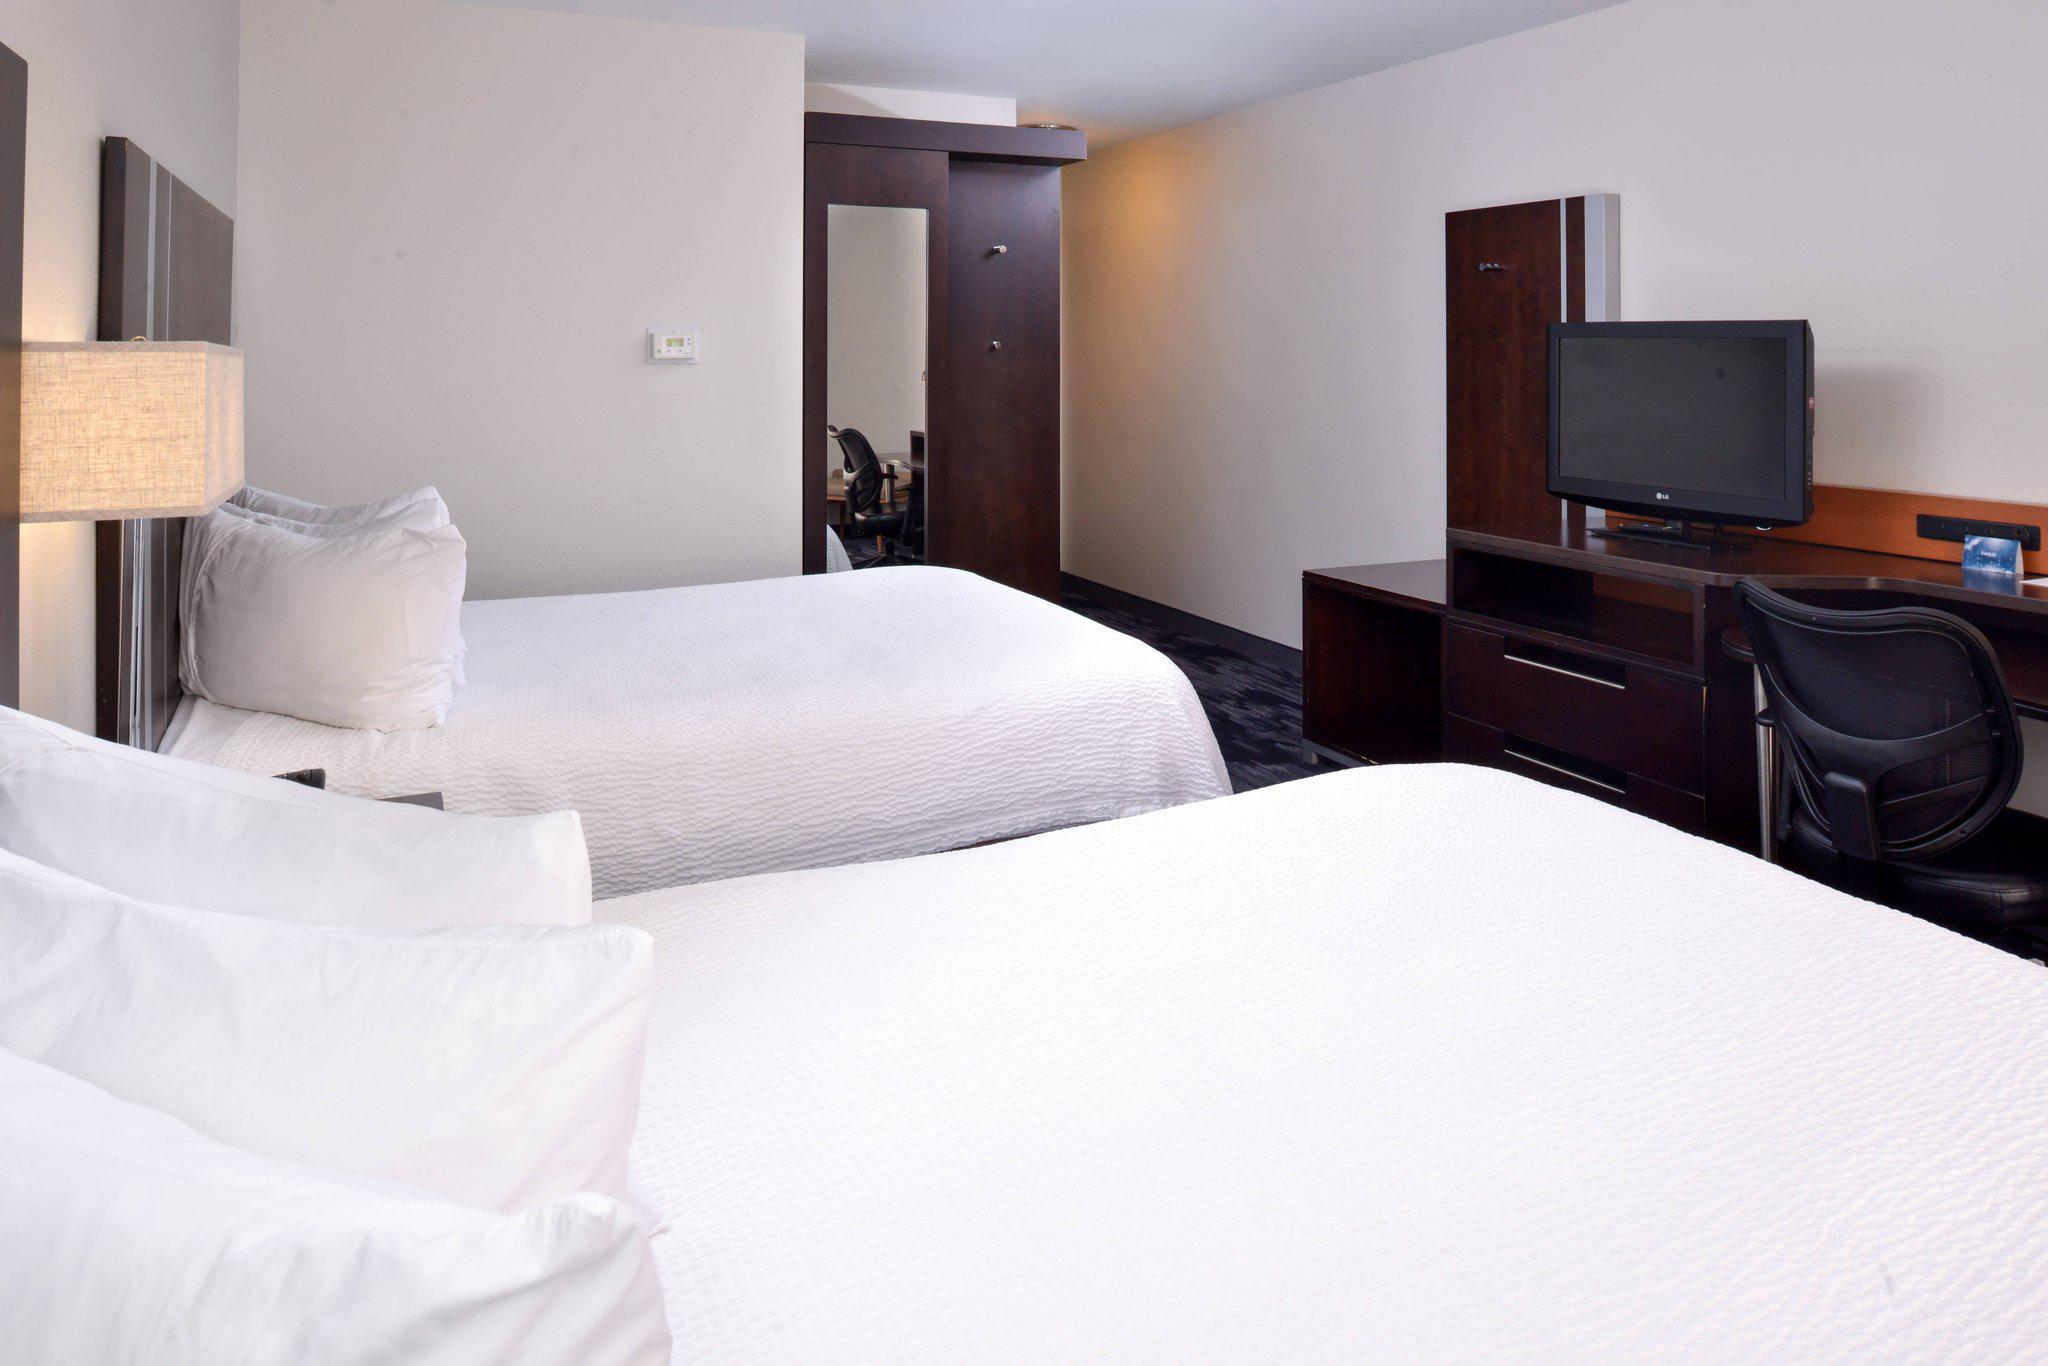 Fairfield Inn & Suites by Marriott Cedar Rapids